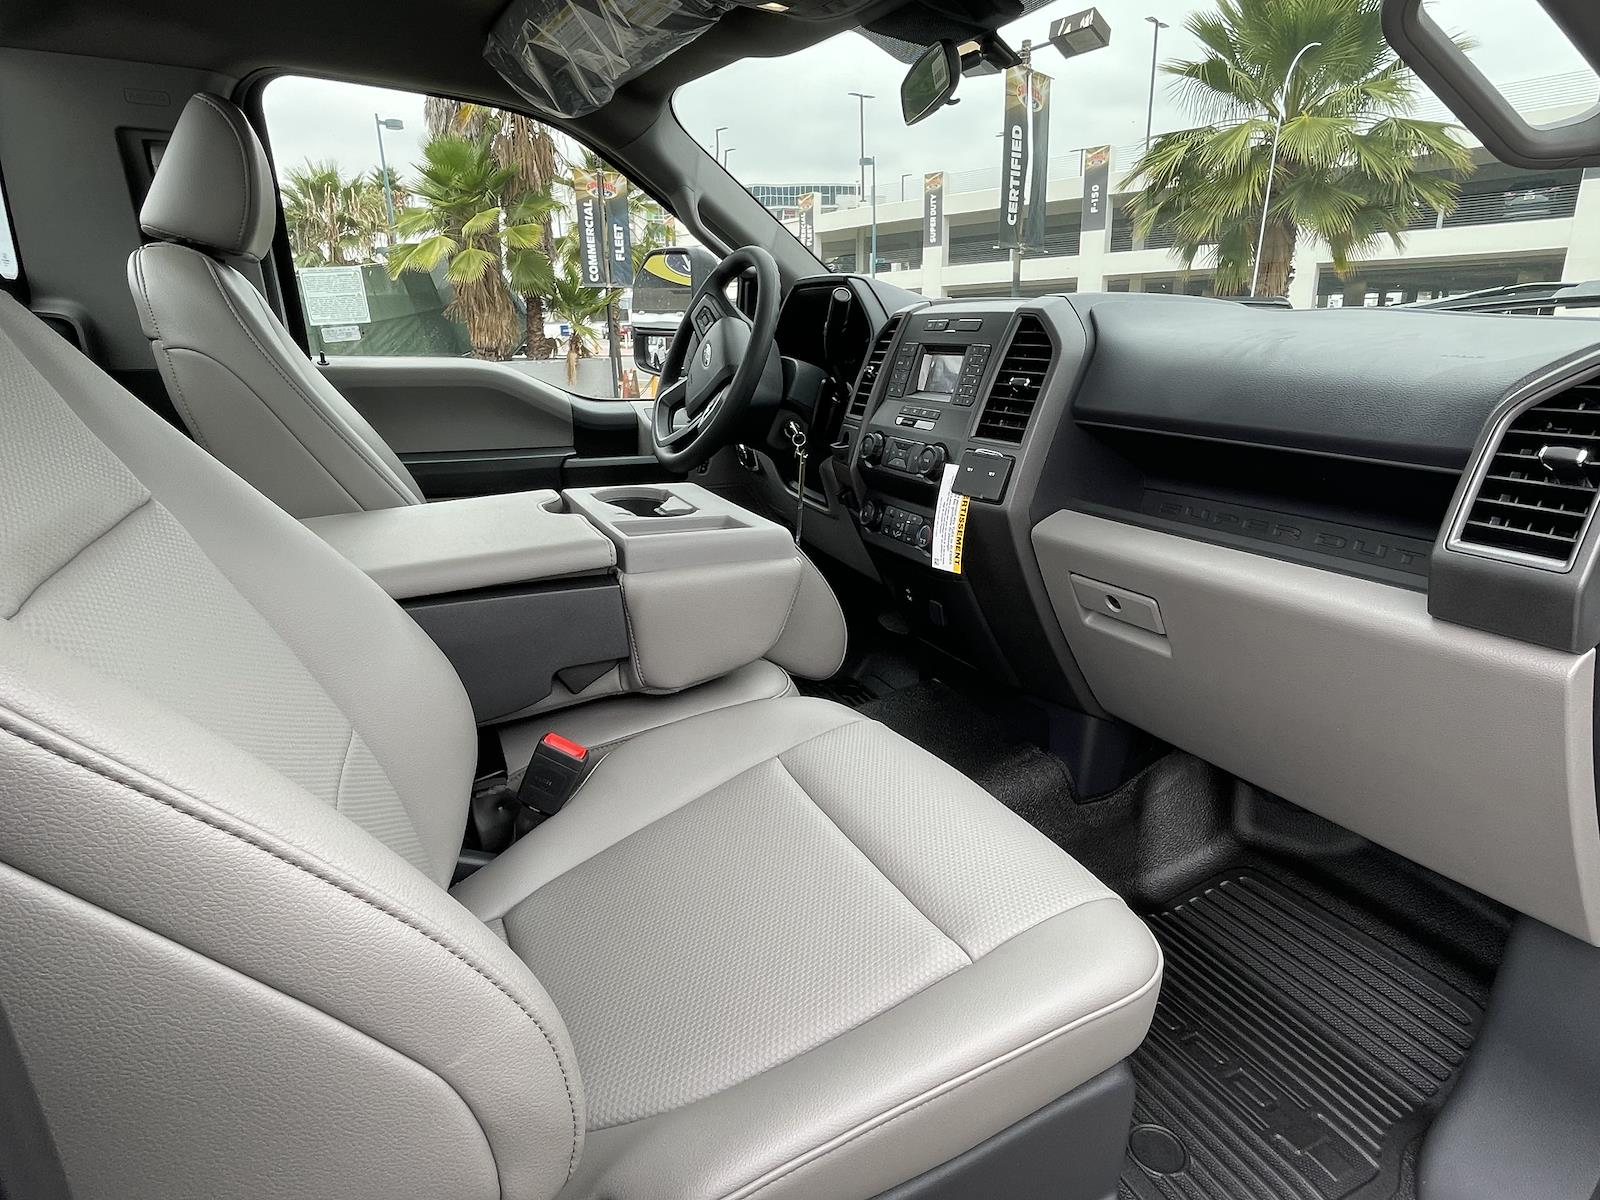 2022 F-450 Regular Cab DRW 4x2,  Cab Chassis #G20003 - photo 5